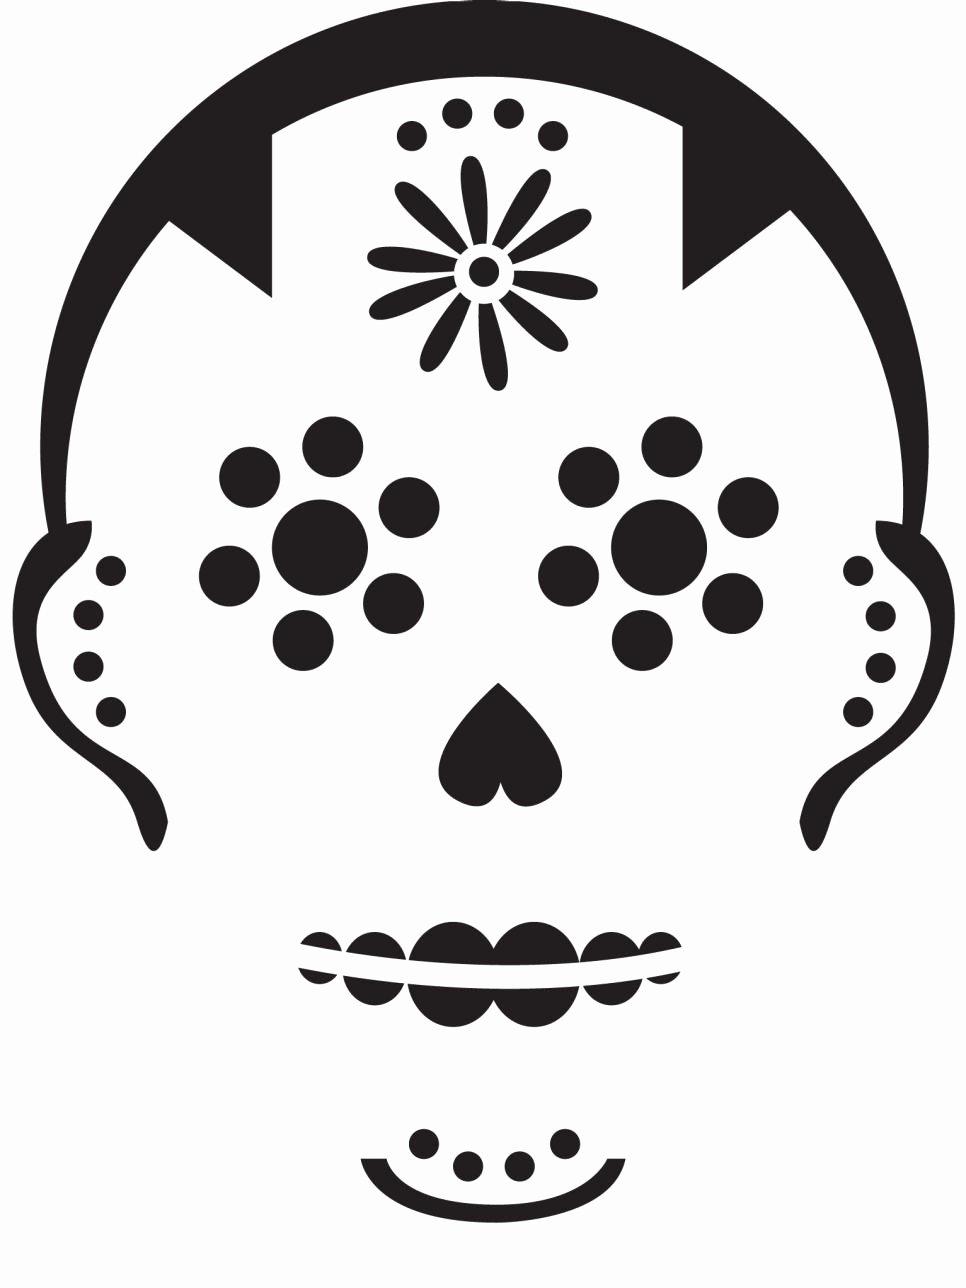 Sugar Skull Pumpkin Carving Stencils Luxury Free Downloadable Pumpkin Carving Patterns